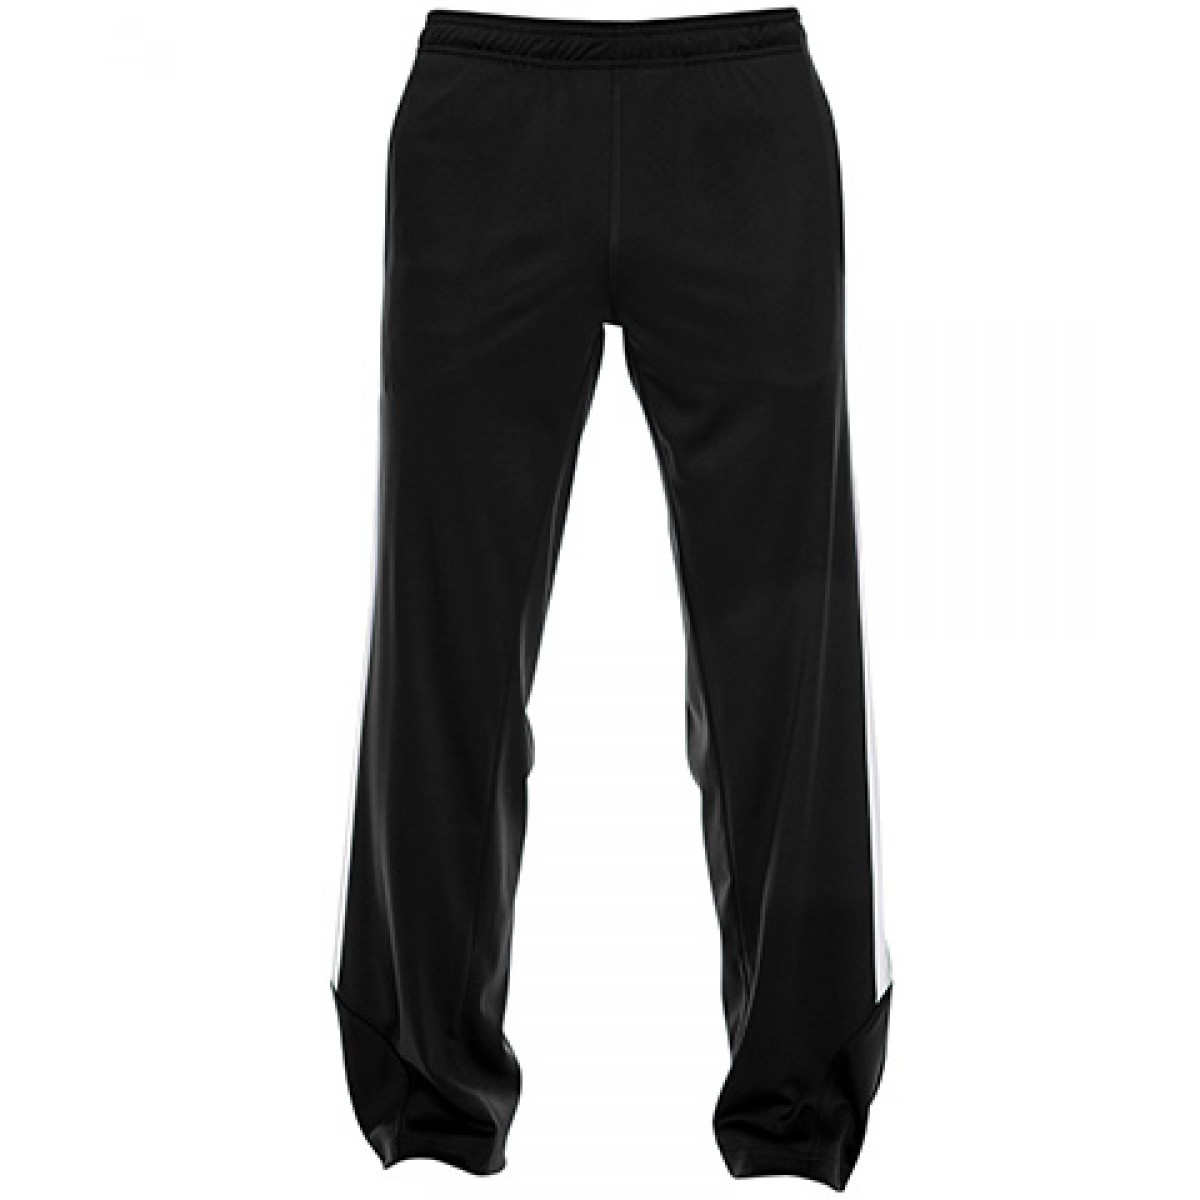 Men's Elite Performance Fleece Pant-Black-L